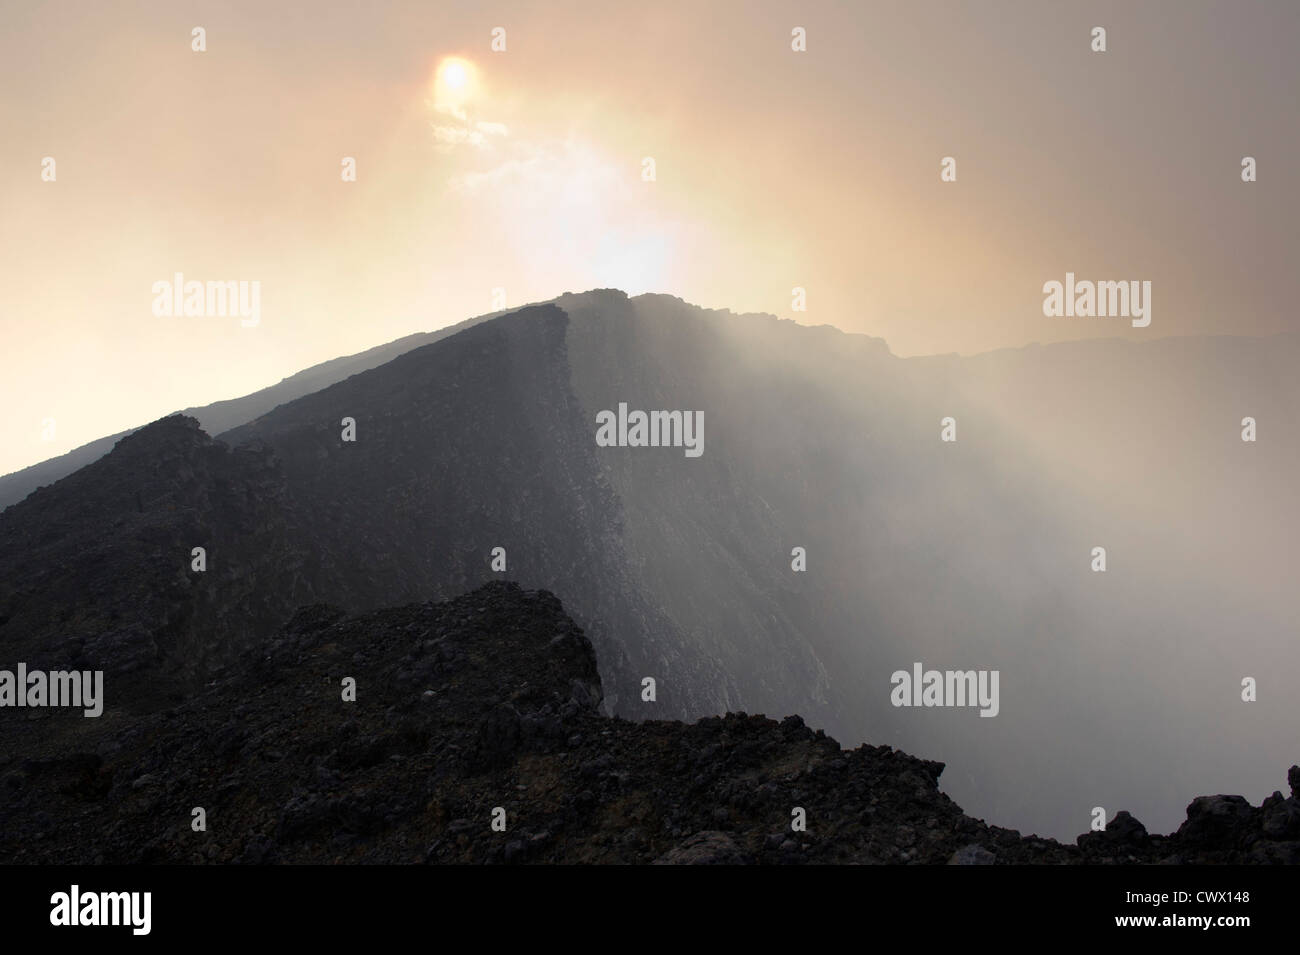 The rim of Nyiragongo Volcano, Virunga National Park, DR Congo - Stock Image